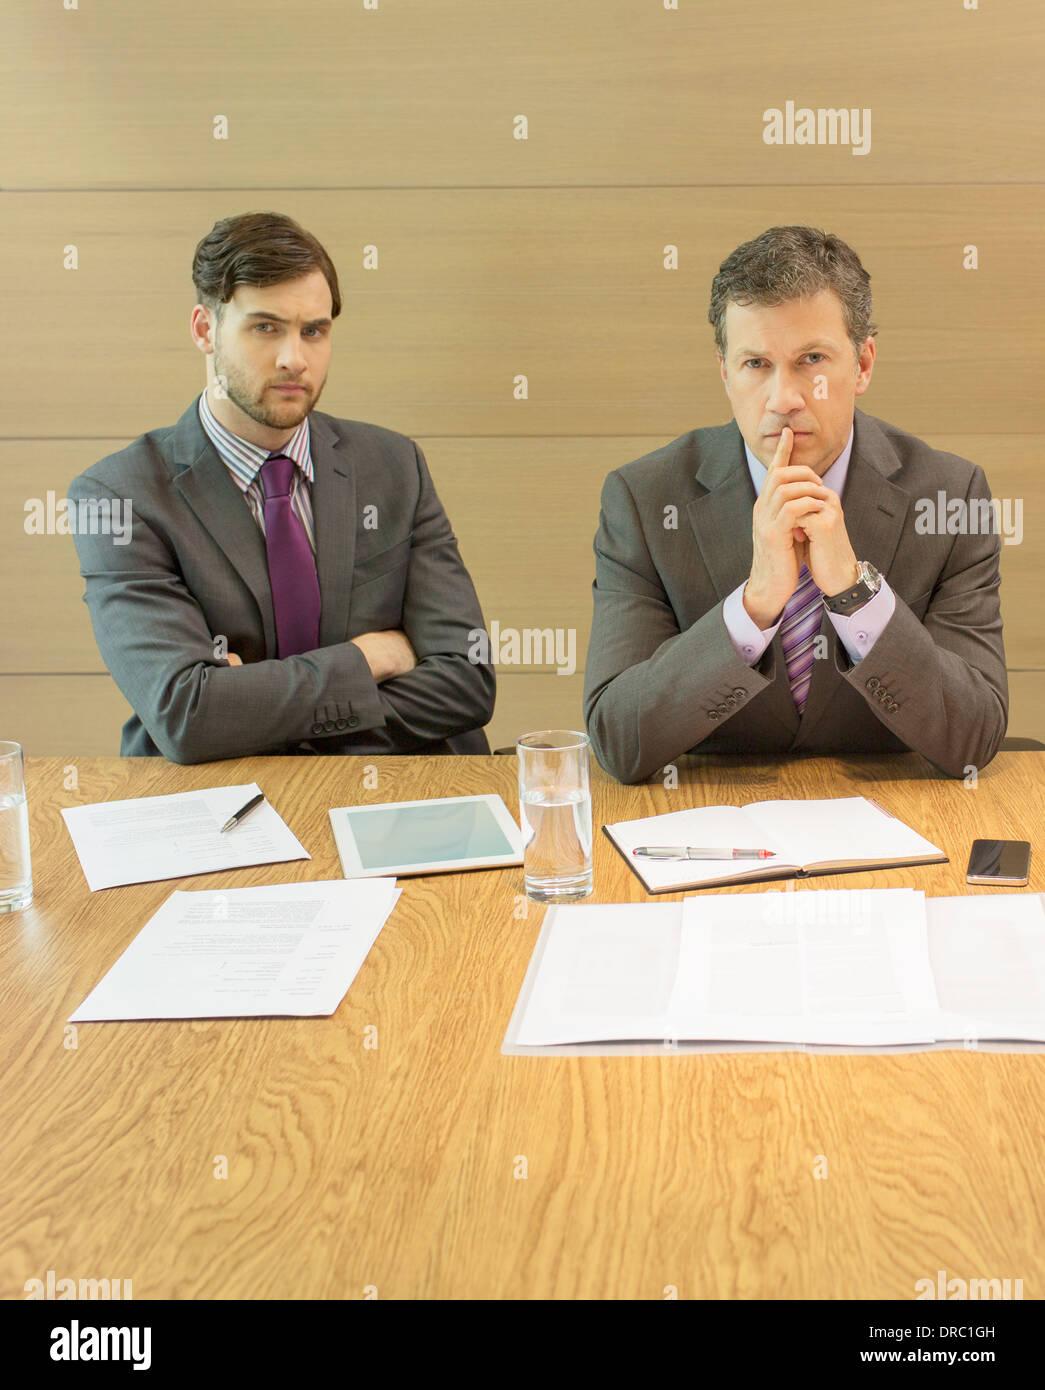 Businessmen sitting in meeting - Stock Image